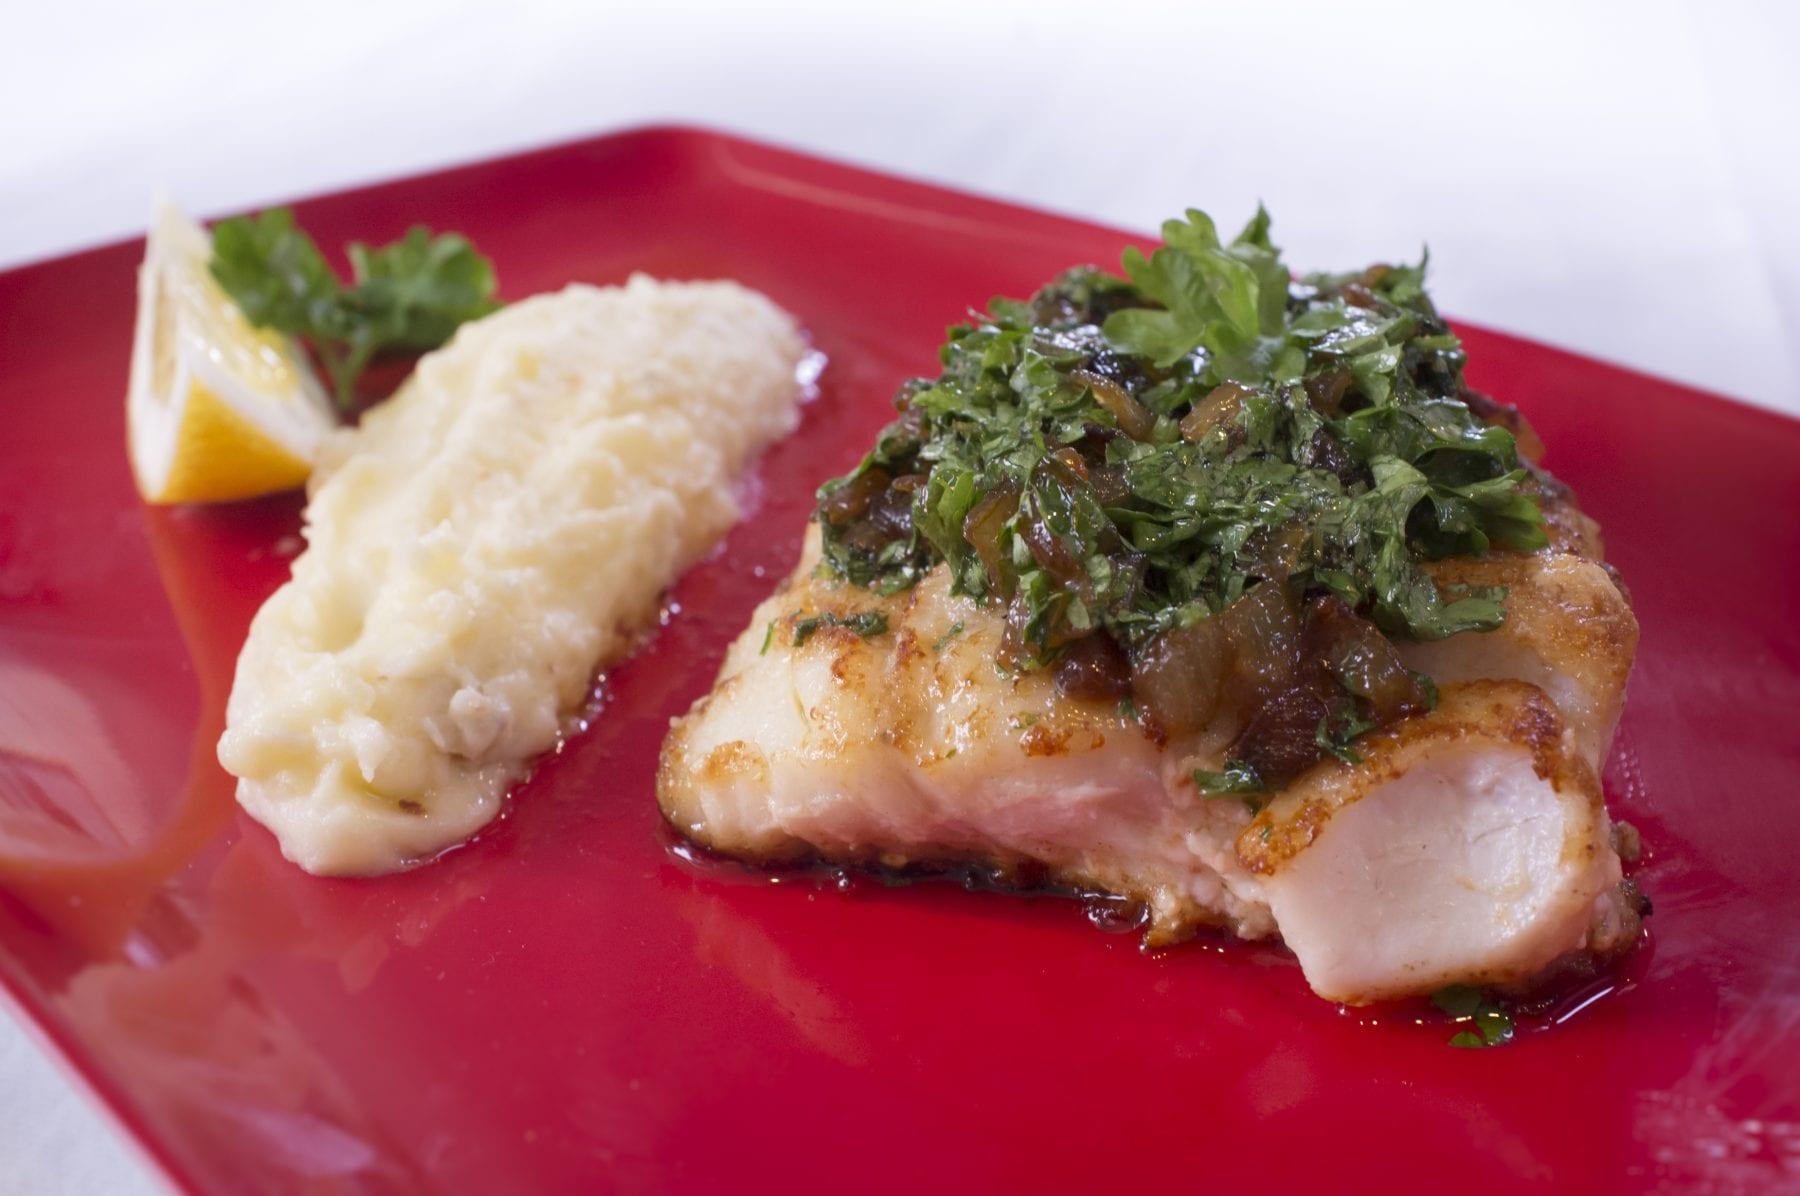 Norwegian Haddock with Mashed Potatoes and Onion Sauce